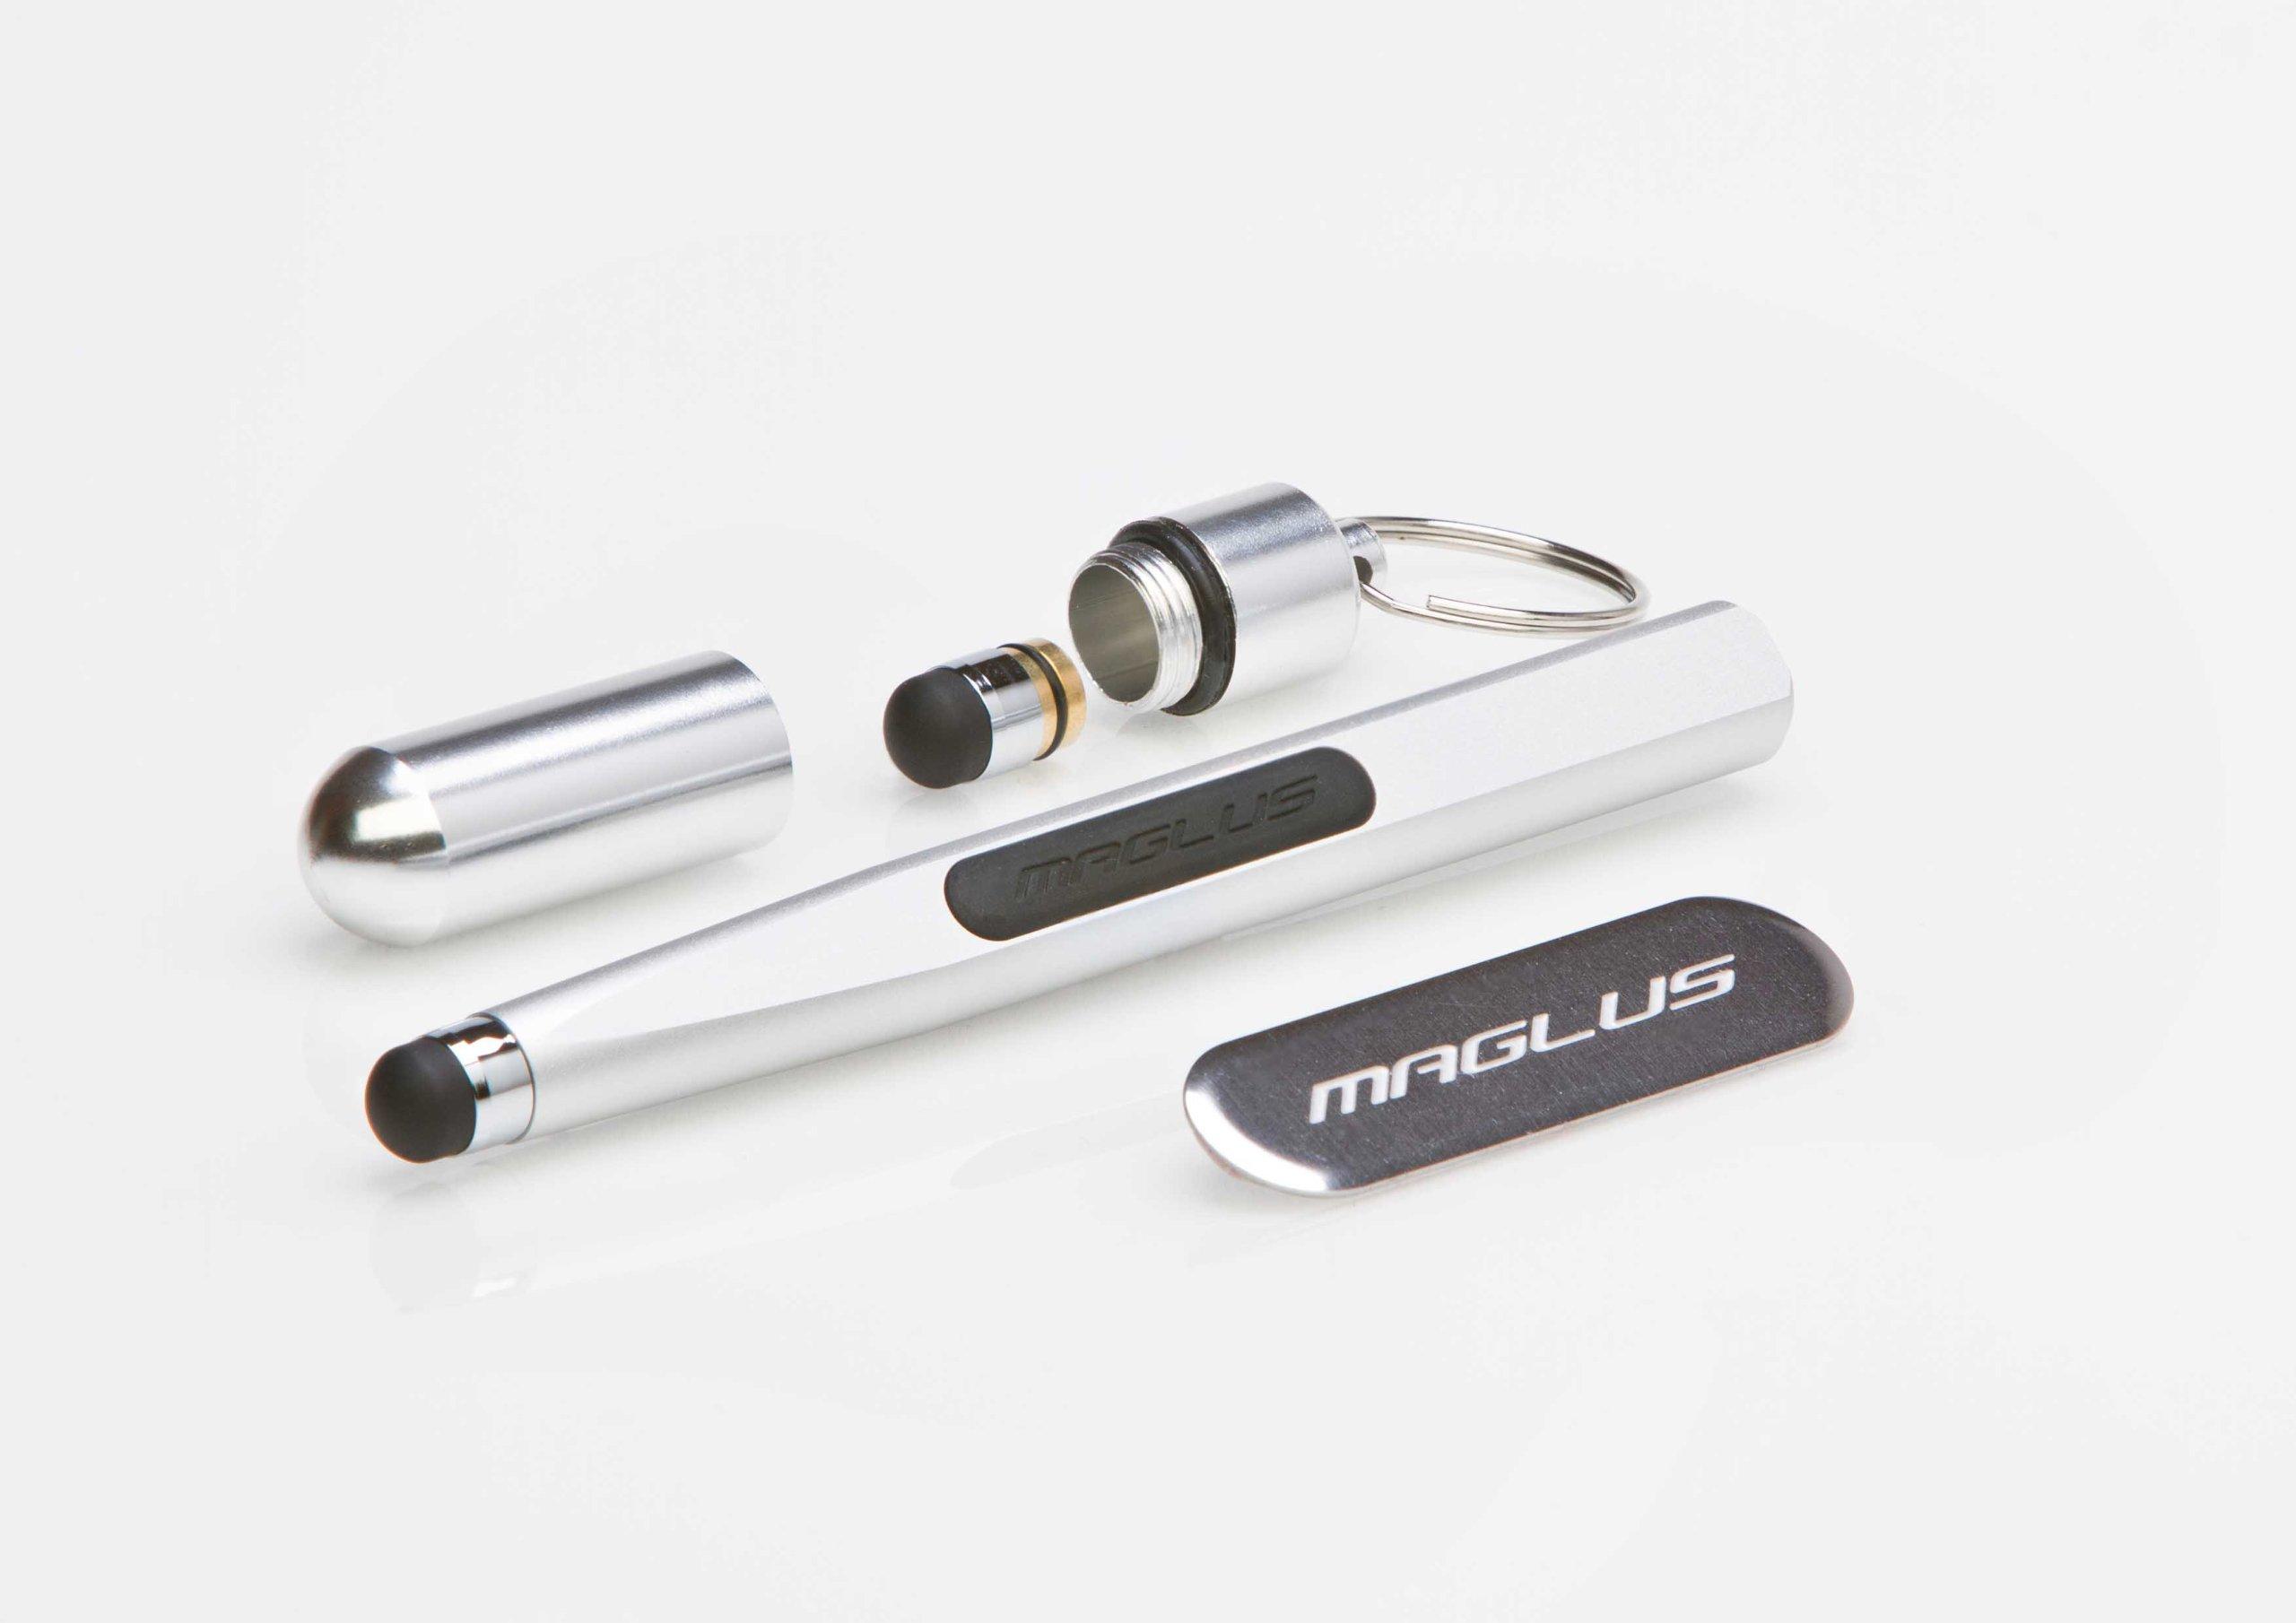 Maglus Stylus by Applydea (Image #1)